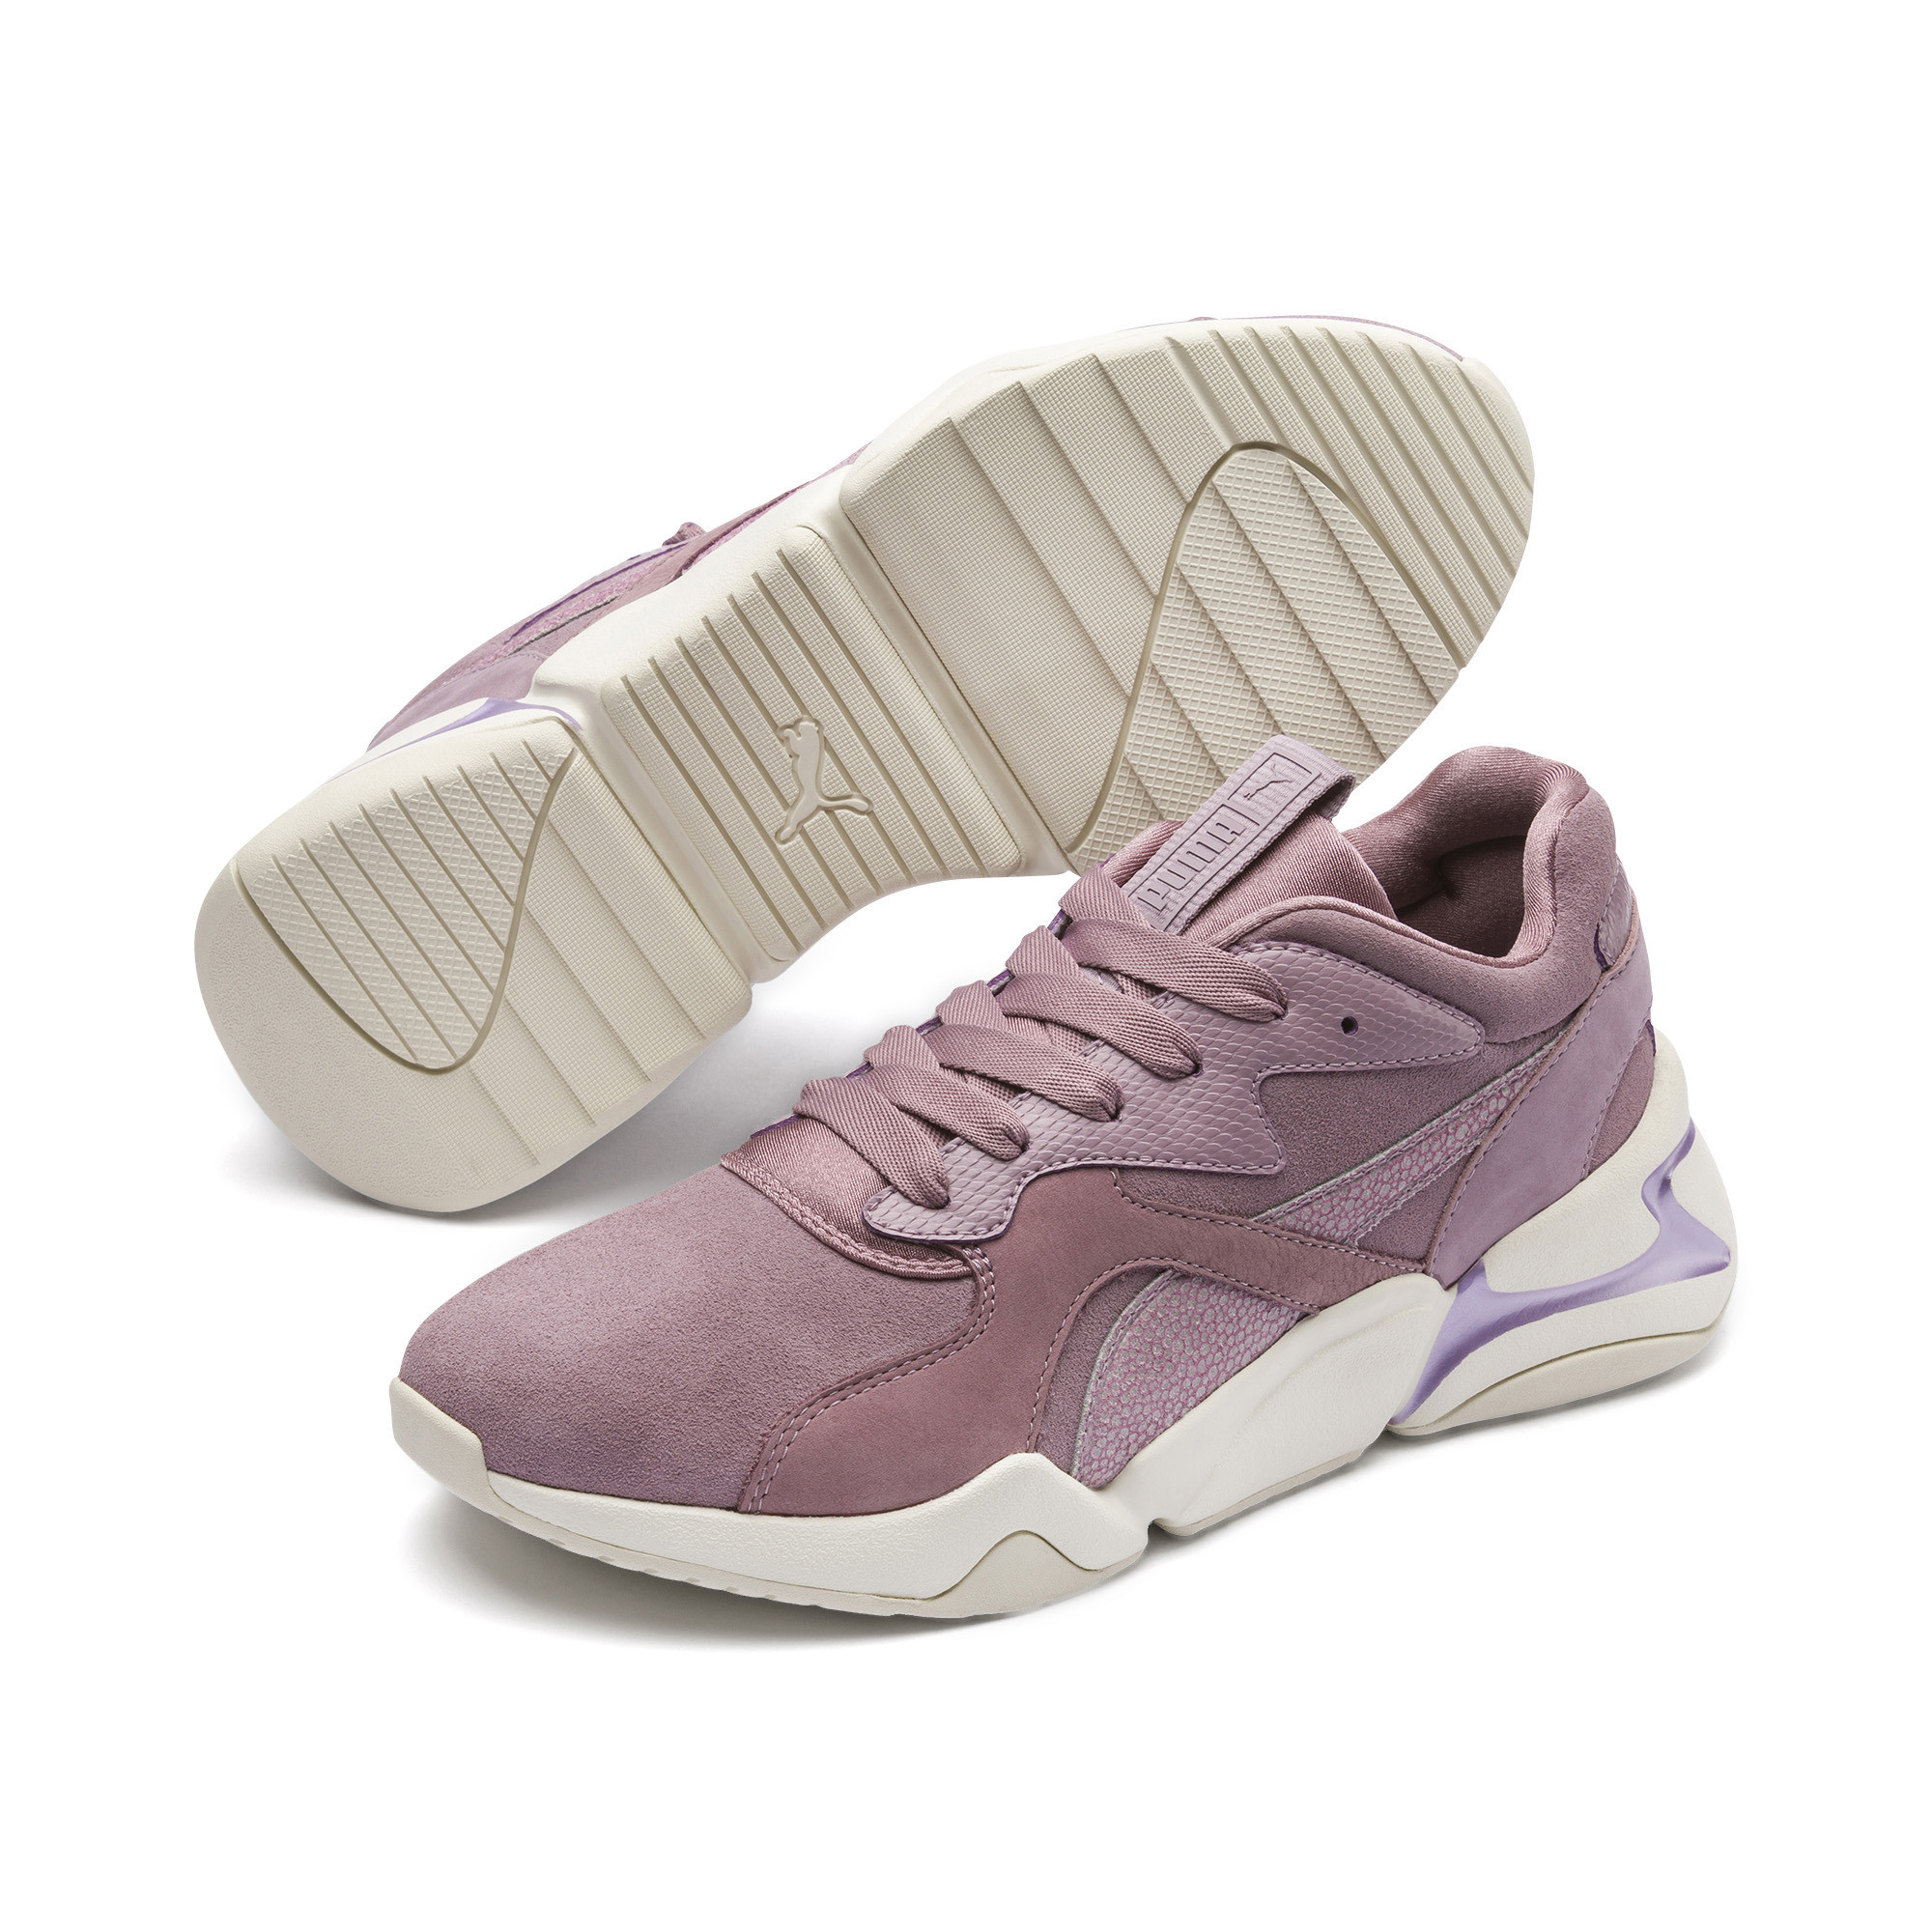 Image Puma Nova Pastel Grunge Women's Sneakers #3